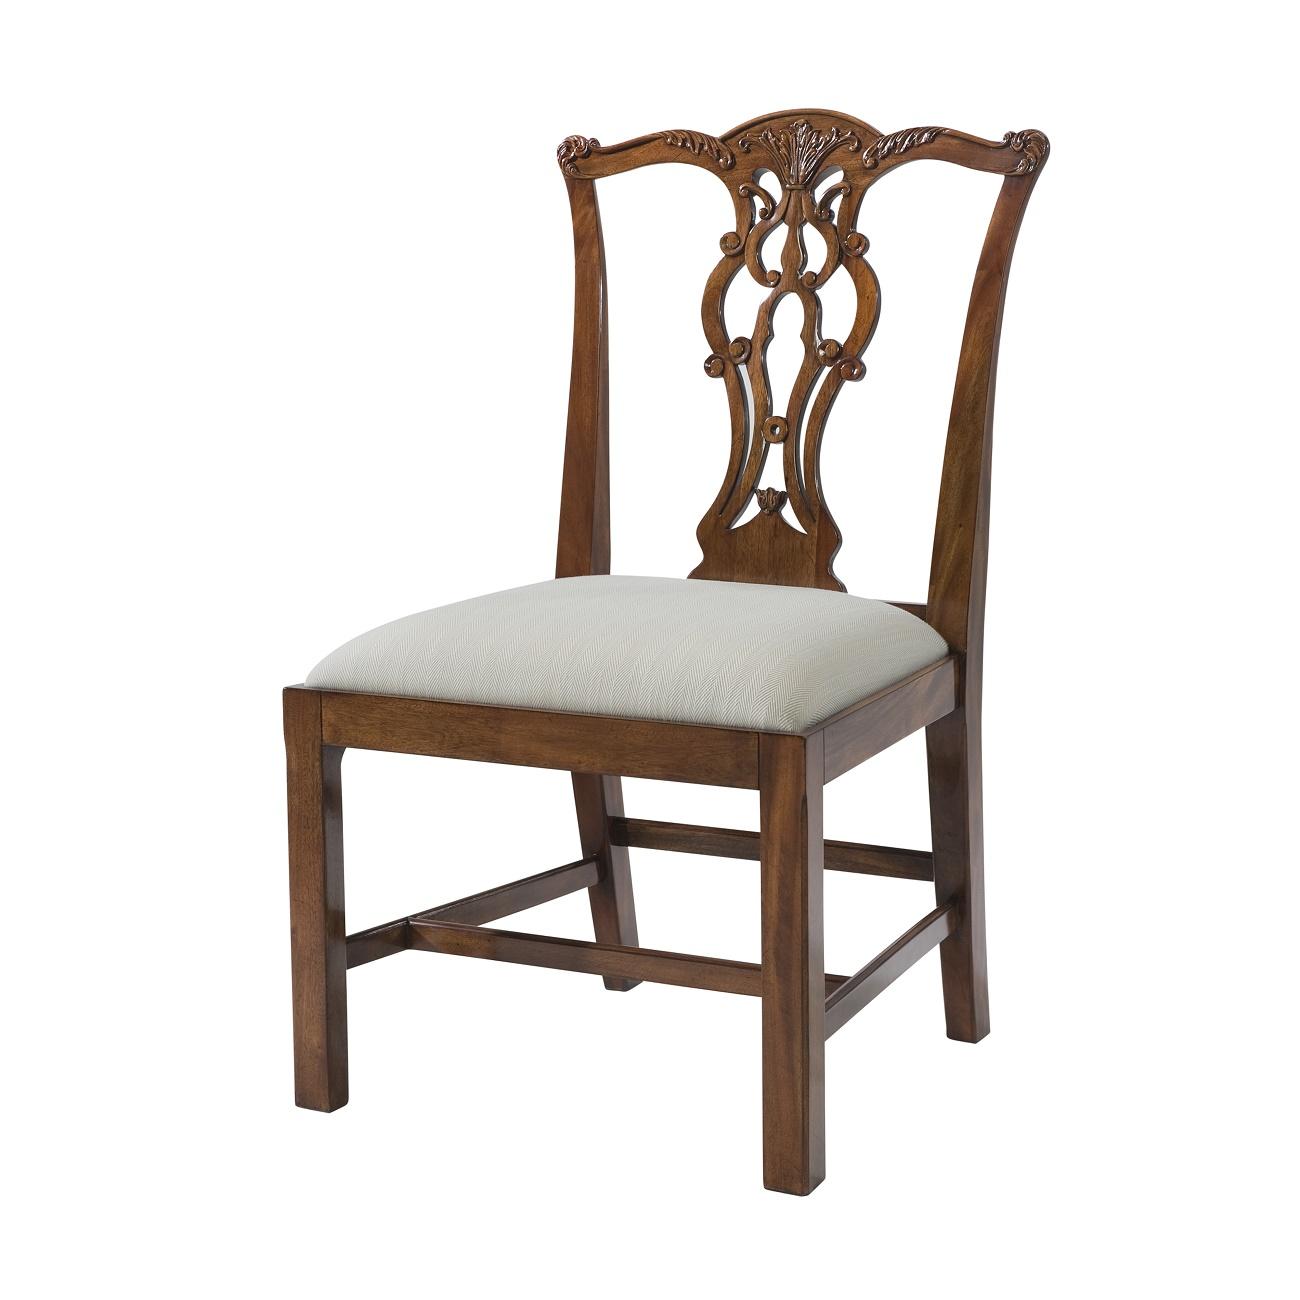 penreath chair theodore alexander mahogany upholstered